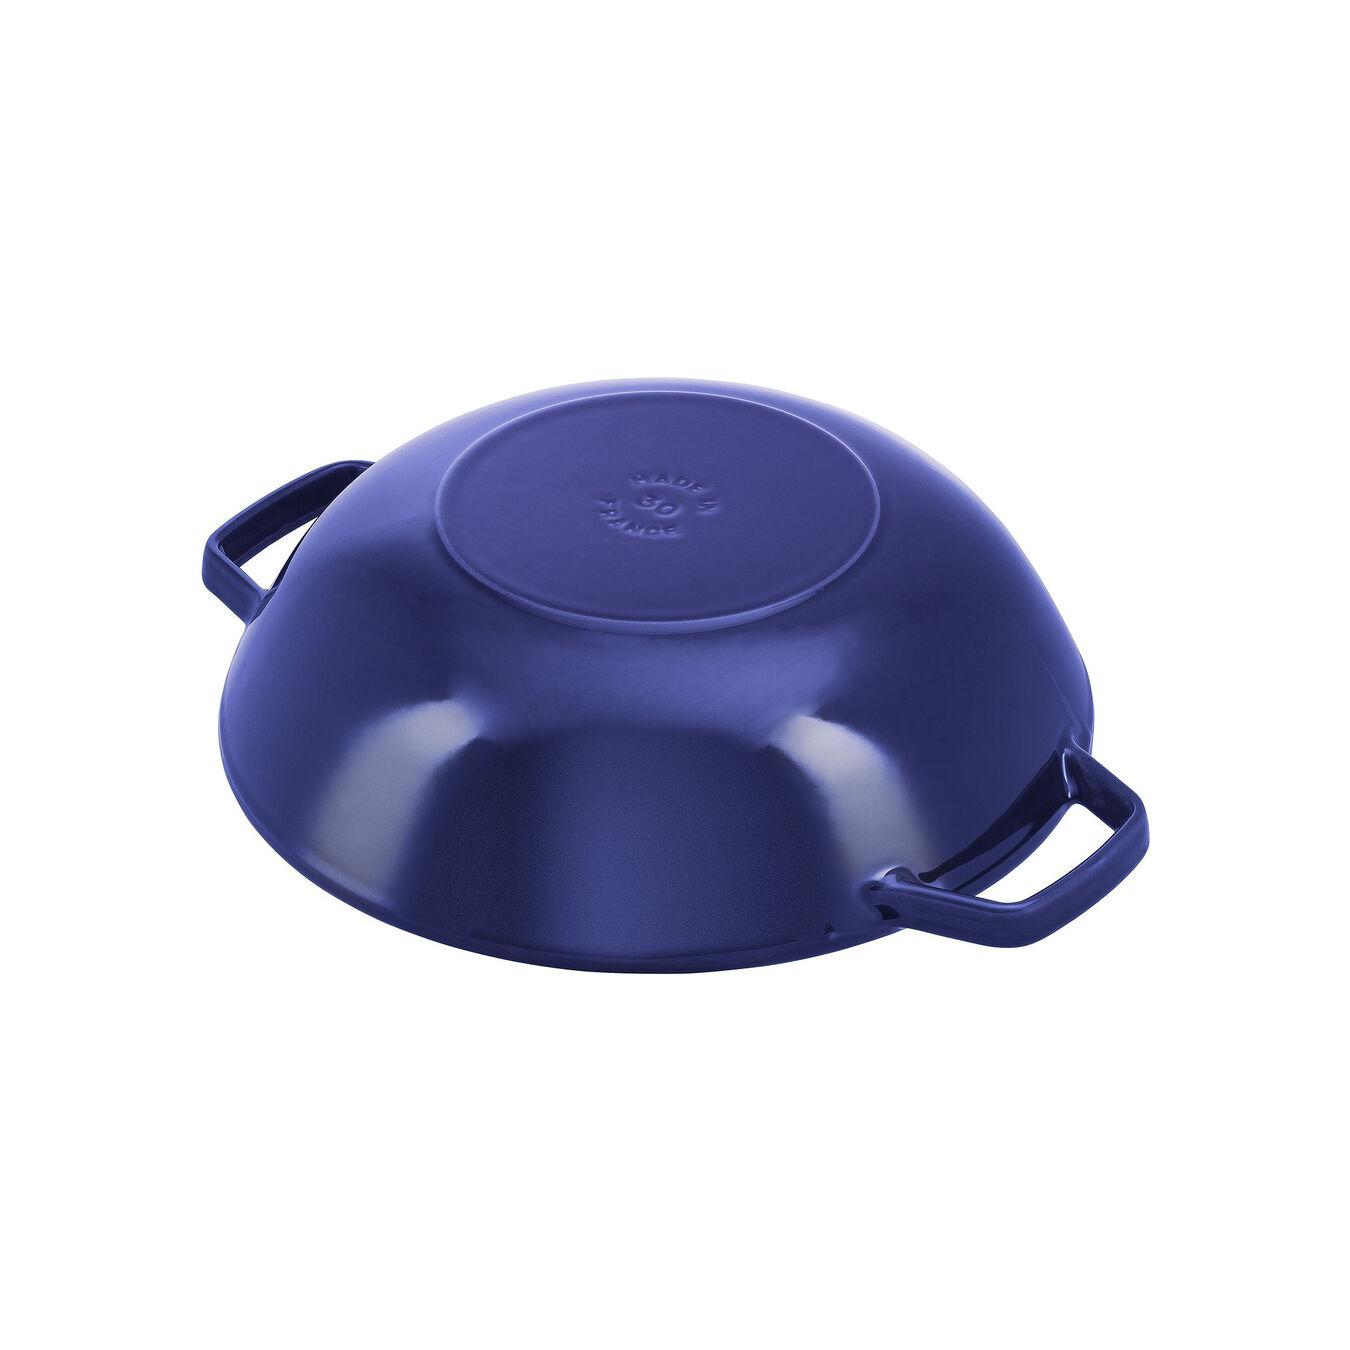 4.5 qt, Wok with glass lid, dark blue,,large 3